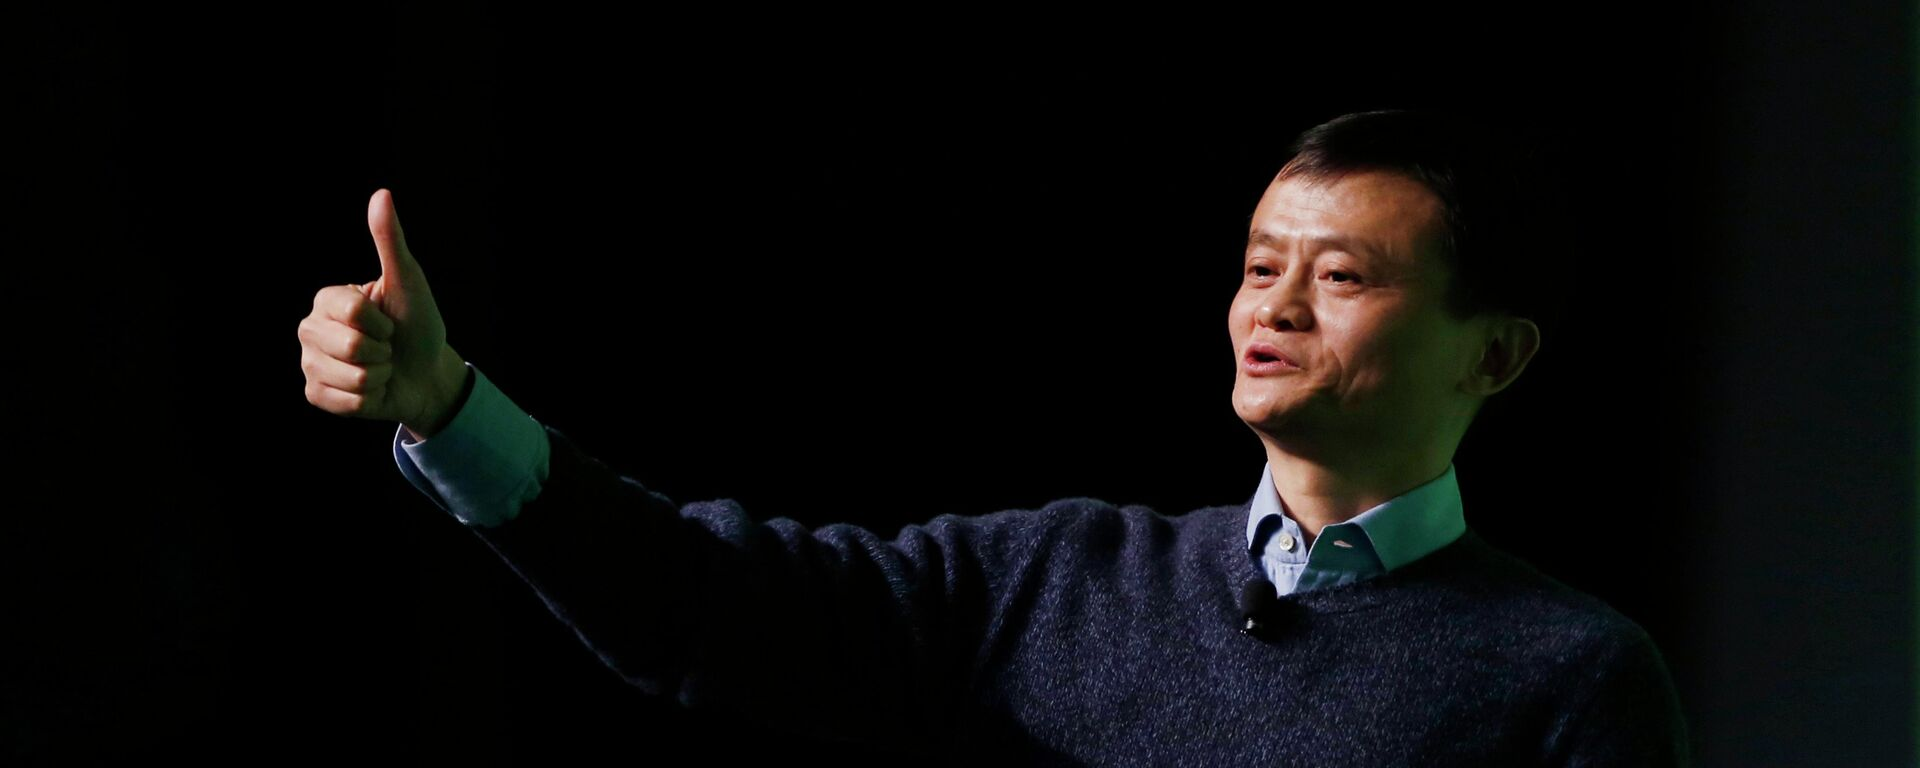 Jack Ma, fundador de Alibaba - Sputnik Mundo, 1920, 03.03.2021